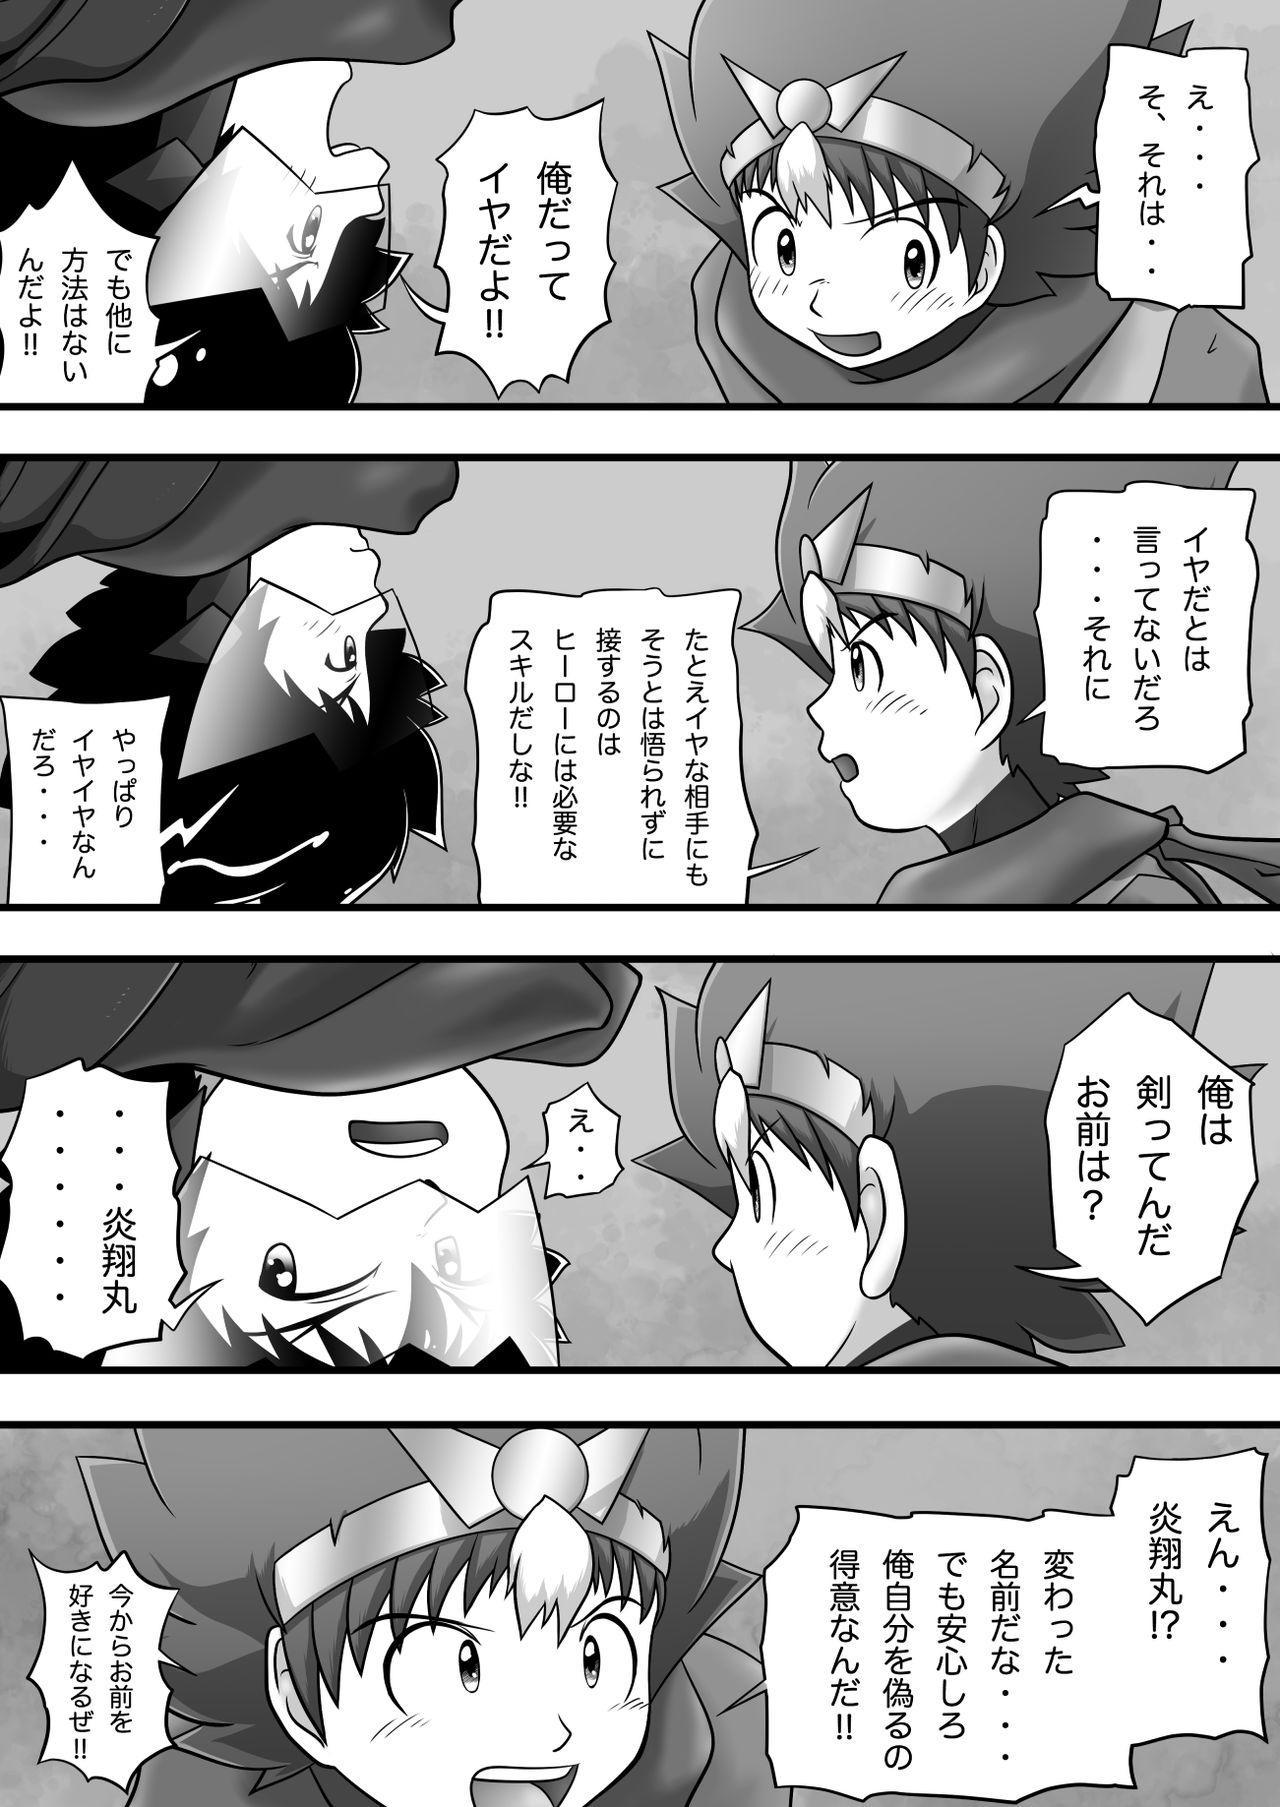 Chrono Kid TSURUGI VS Enboy 26